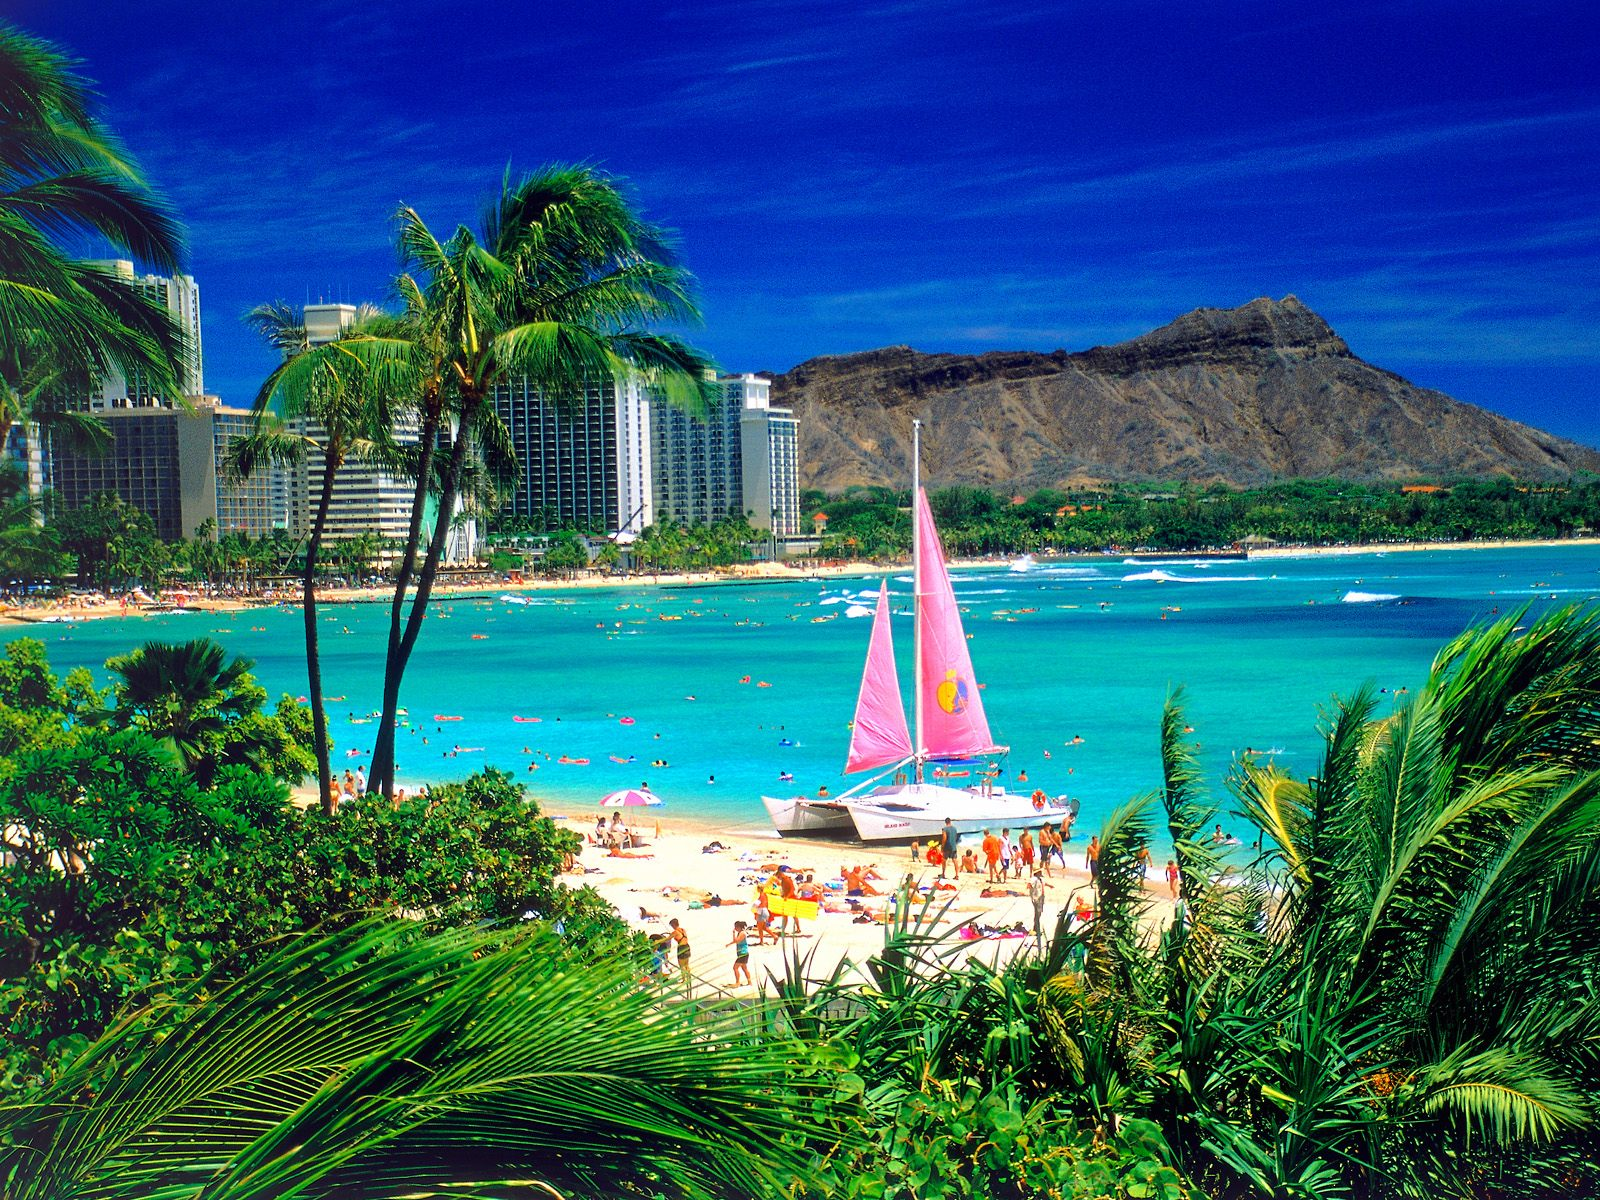 Waikiki Oahu Hawaii Wallpapers HD Wallpapers 1600x1200